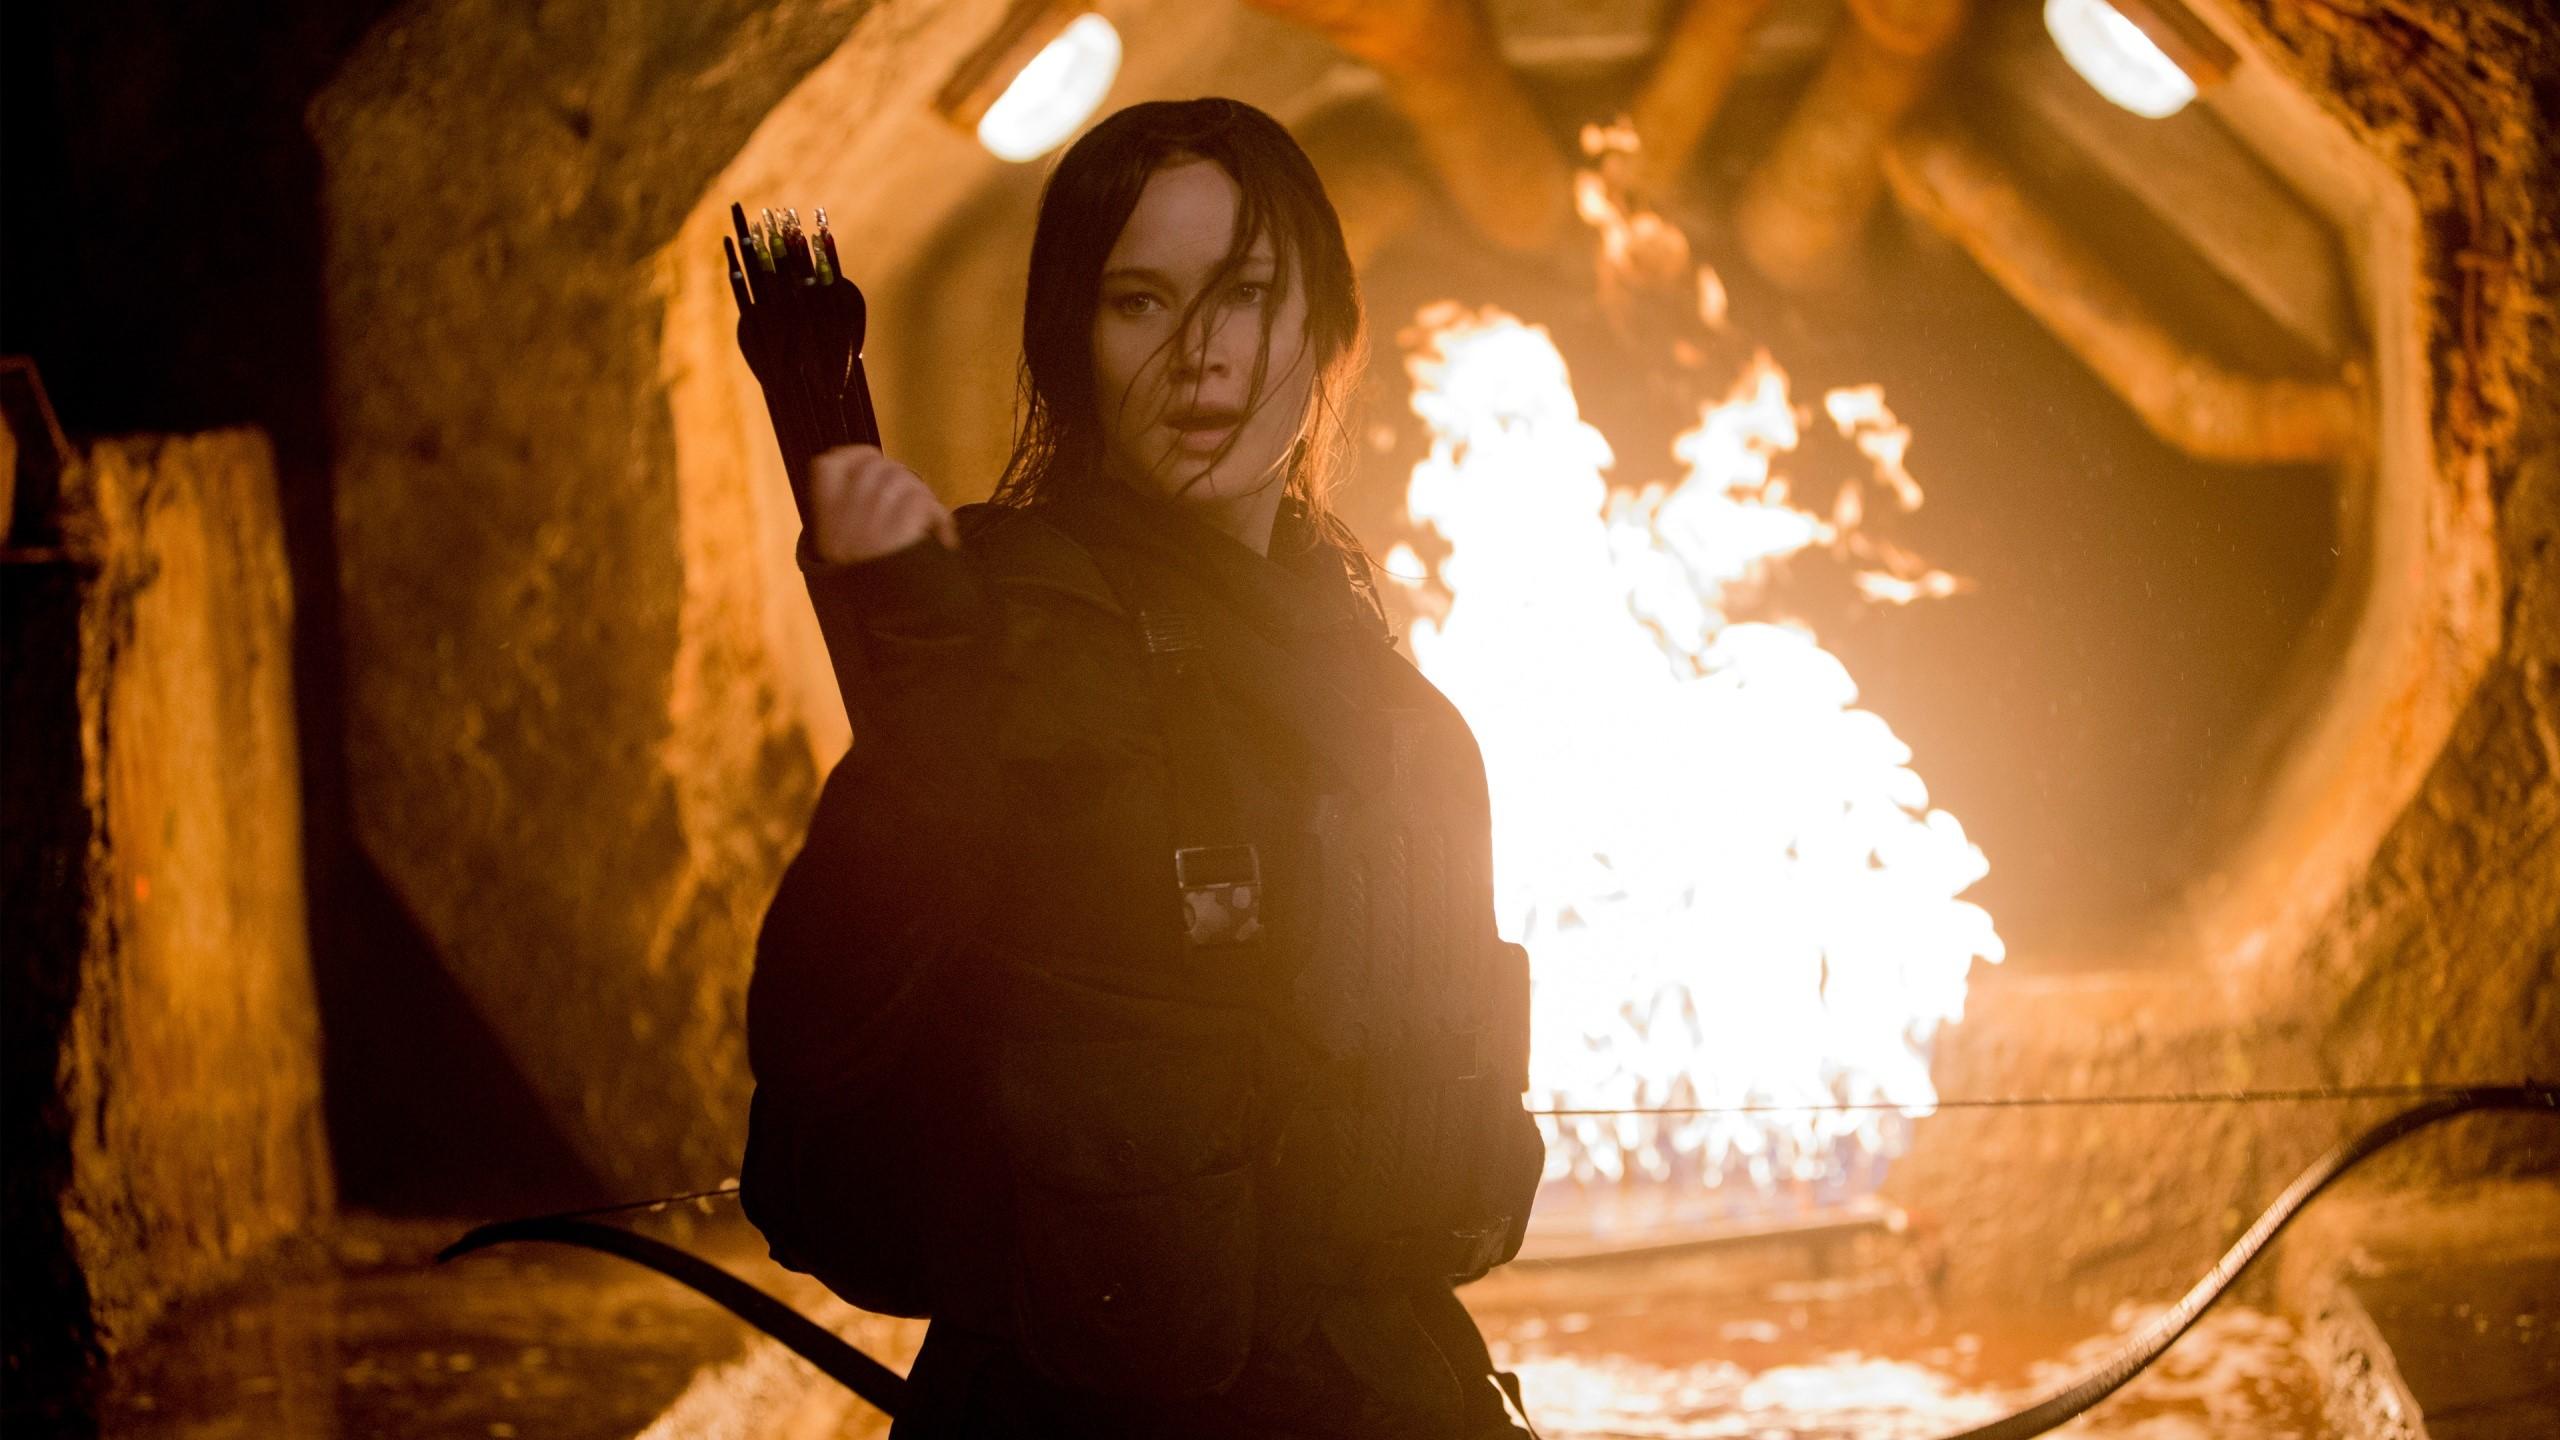 Fondos de pantalla Katniss lanzando una flecha